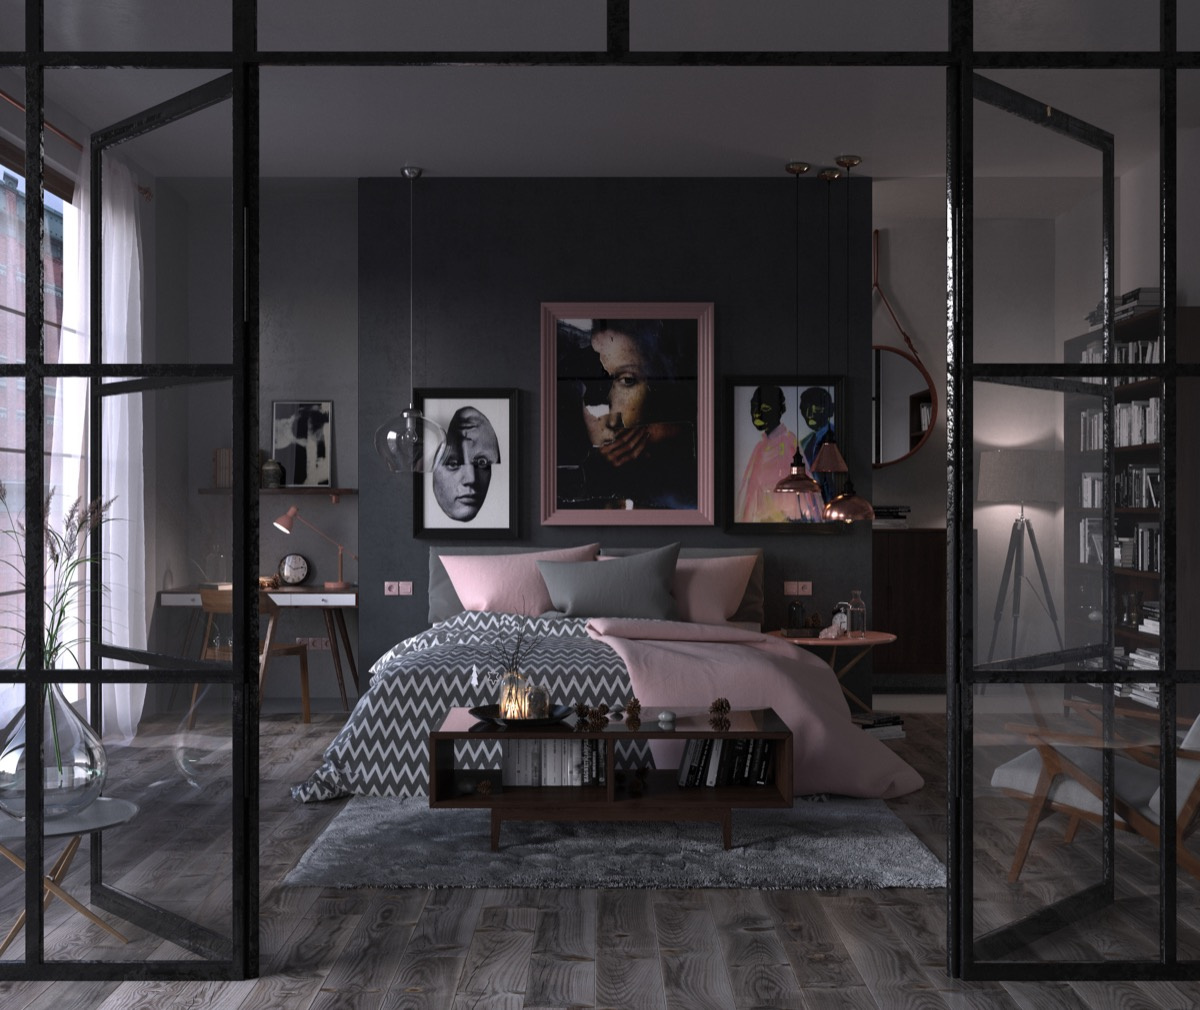 Dark Gray Bedrooms: 40 Beautiful Bedrooms That We Are In Awe Of